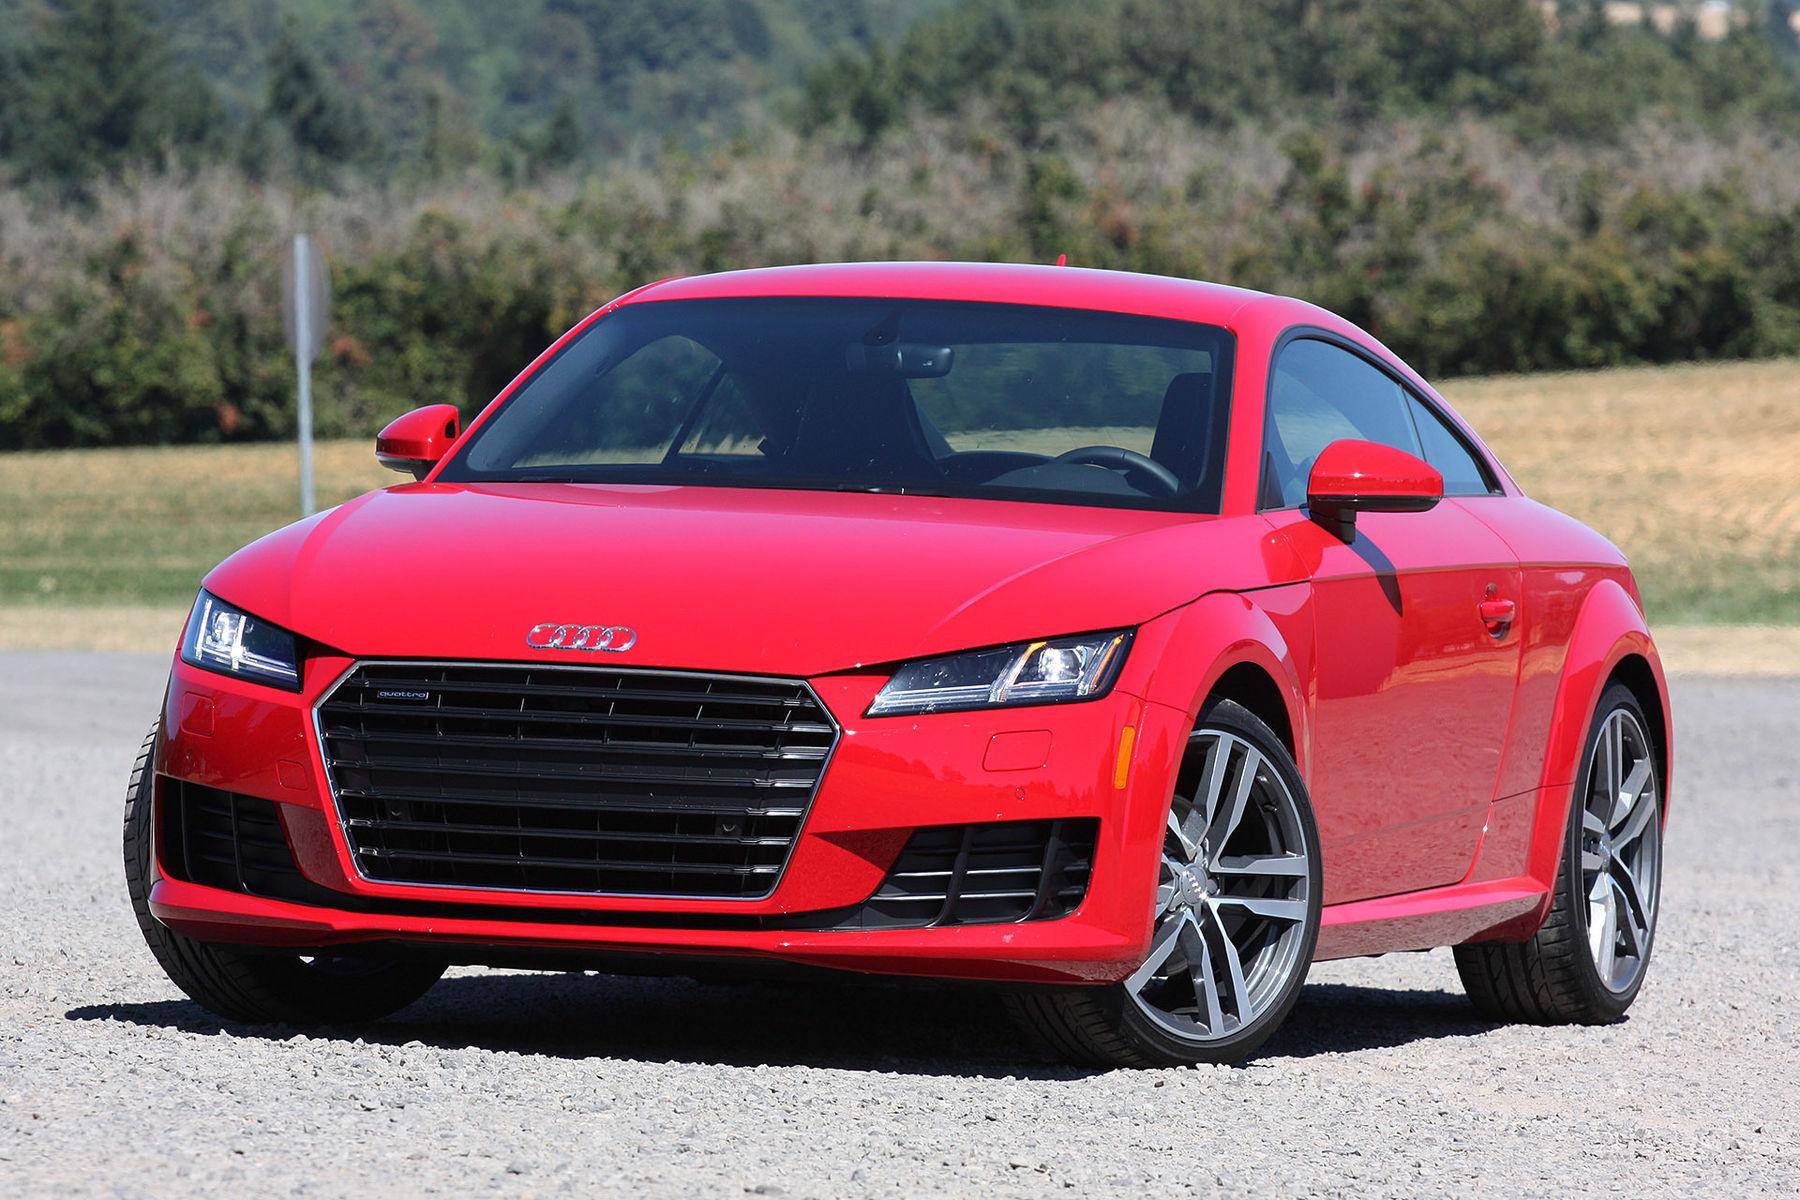 2016 Audi TT | 2016 Audi TT